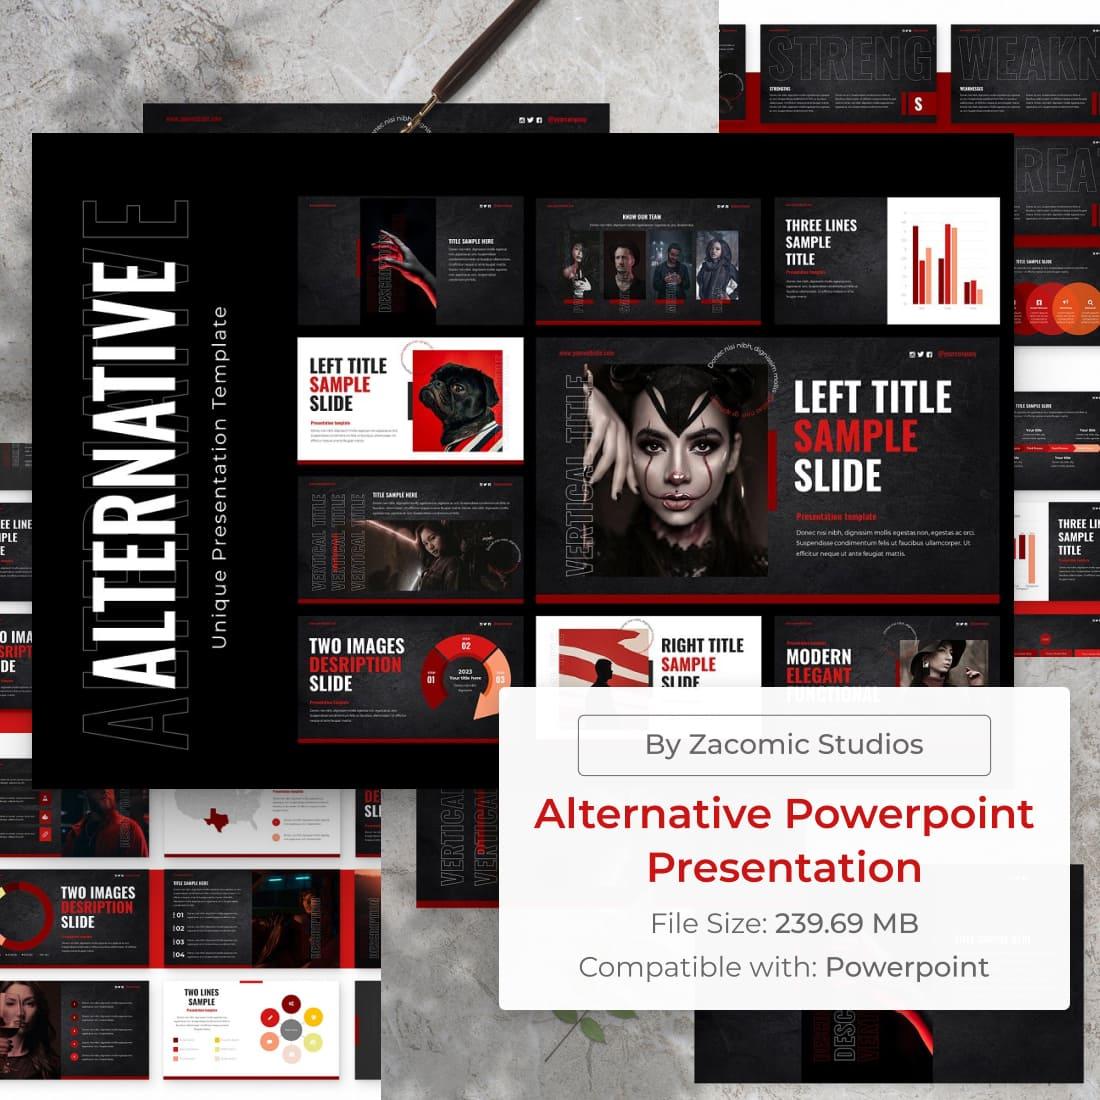 01 Alternative Powerpoint Presentation 1100x1100 1